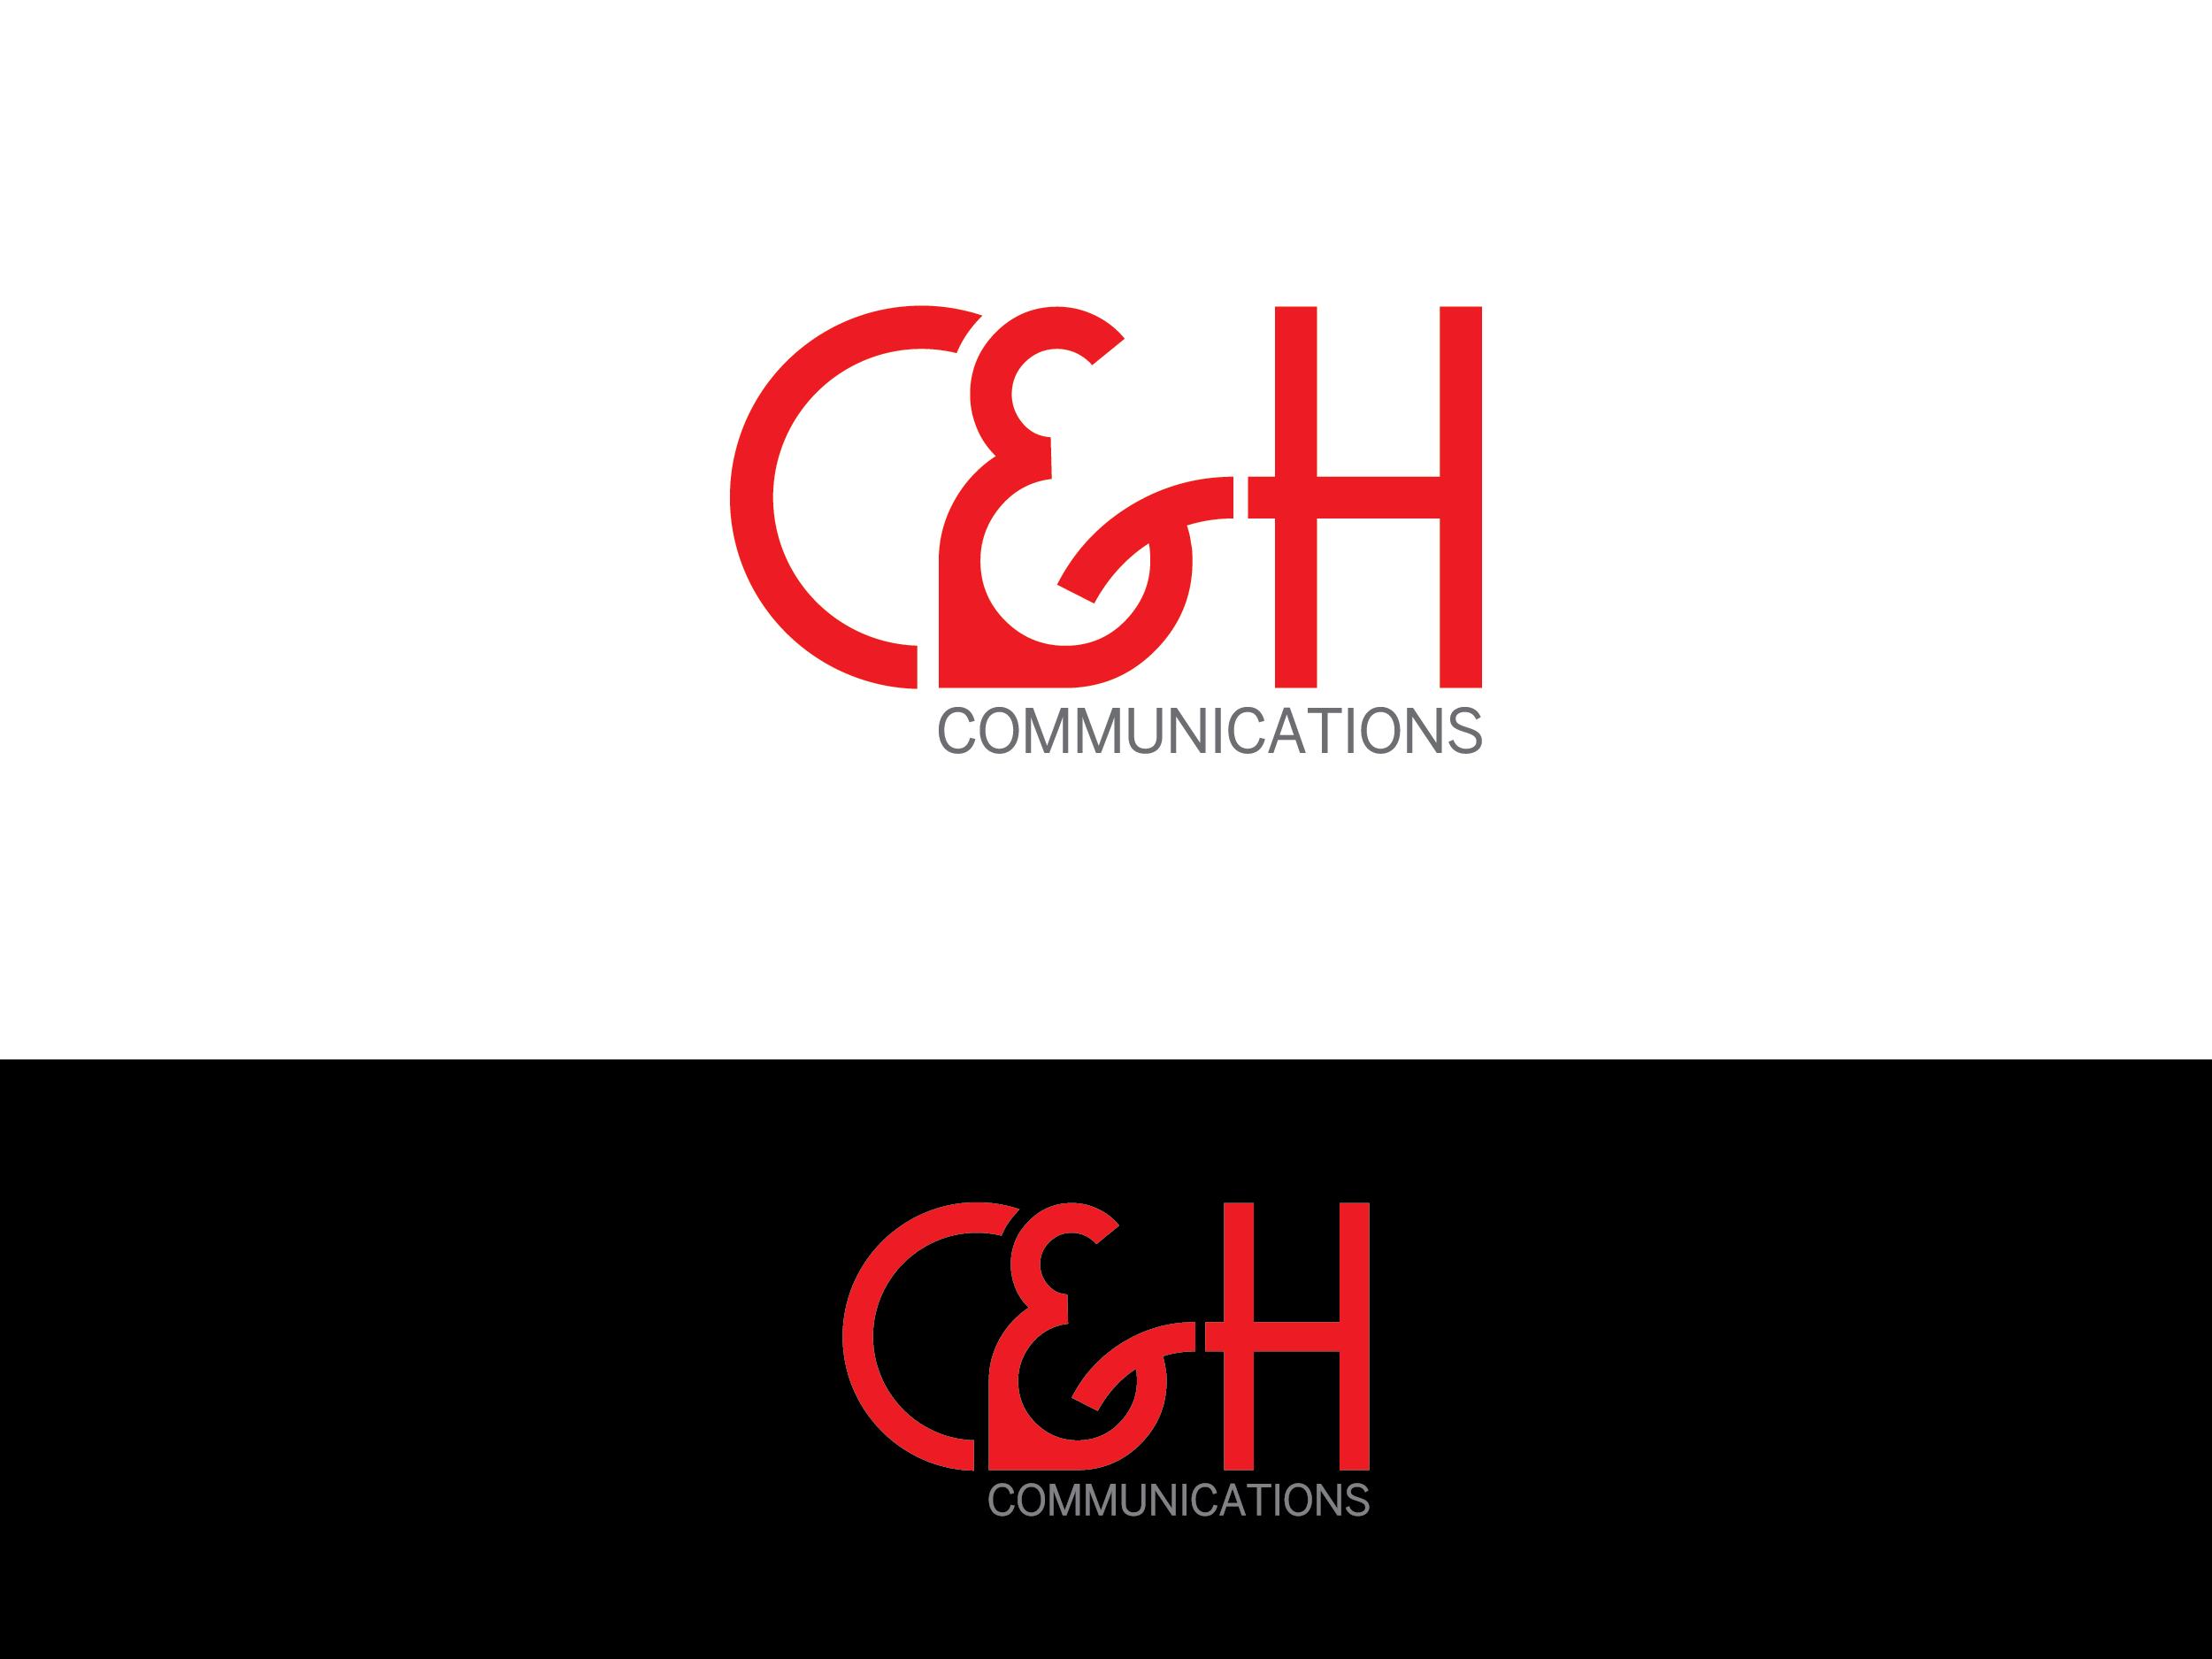 Logo Design by Shahab Uddin - Entry No. 26 in the Logo Design Contest Artistic Logo Design for C&H Communications.